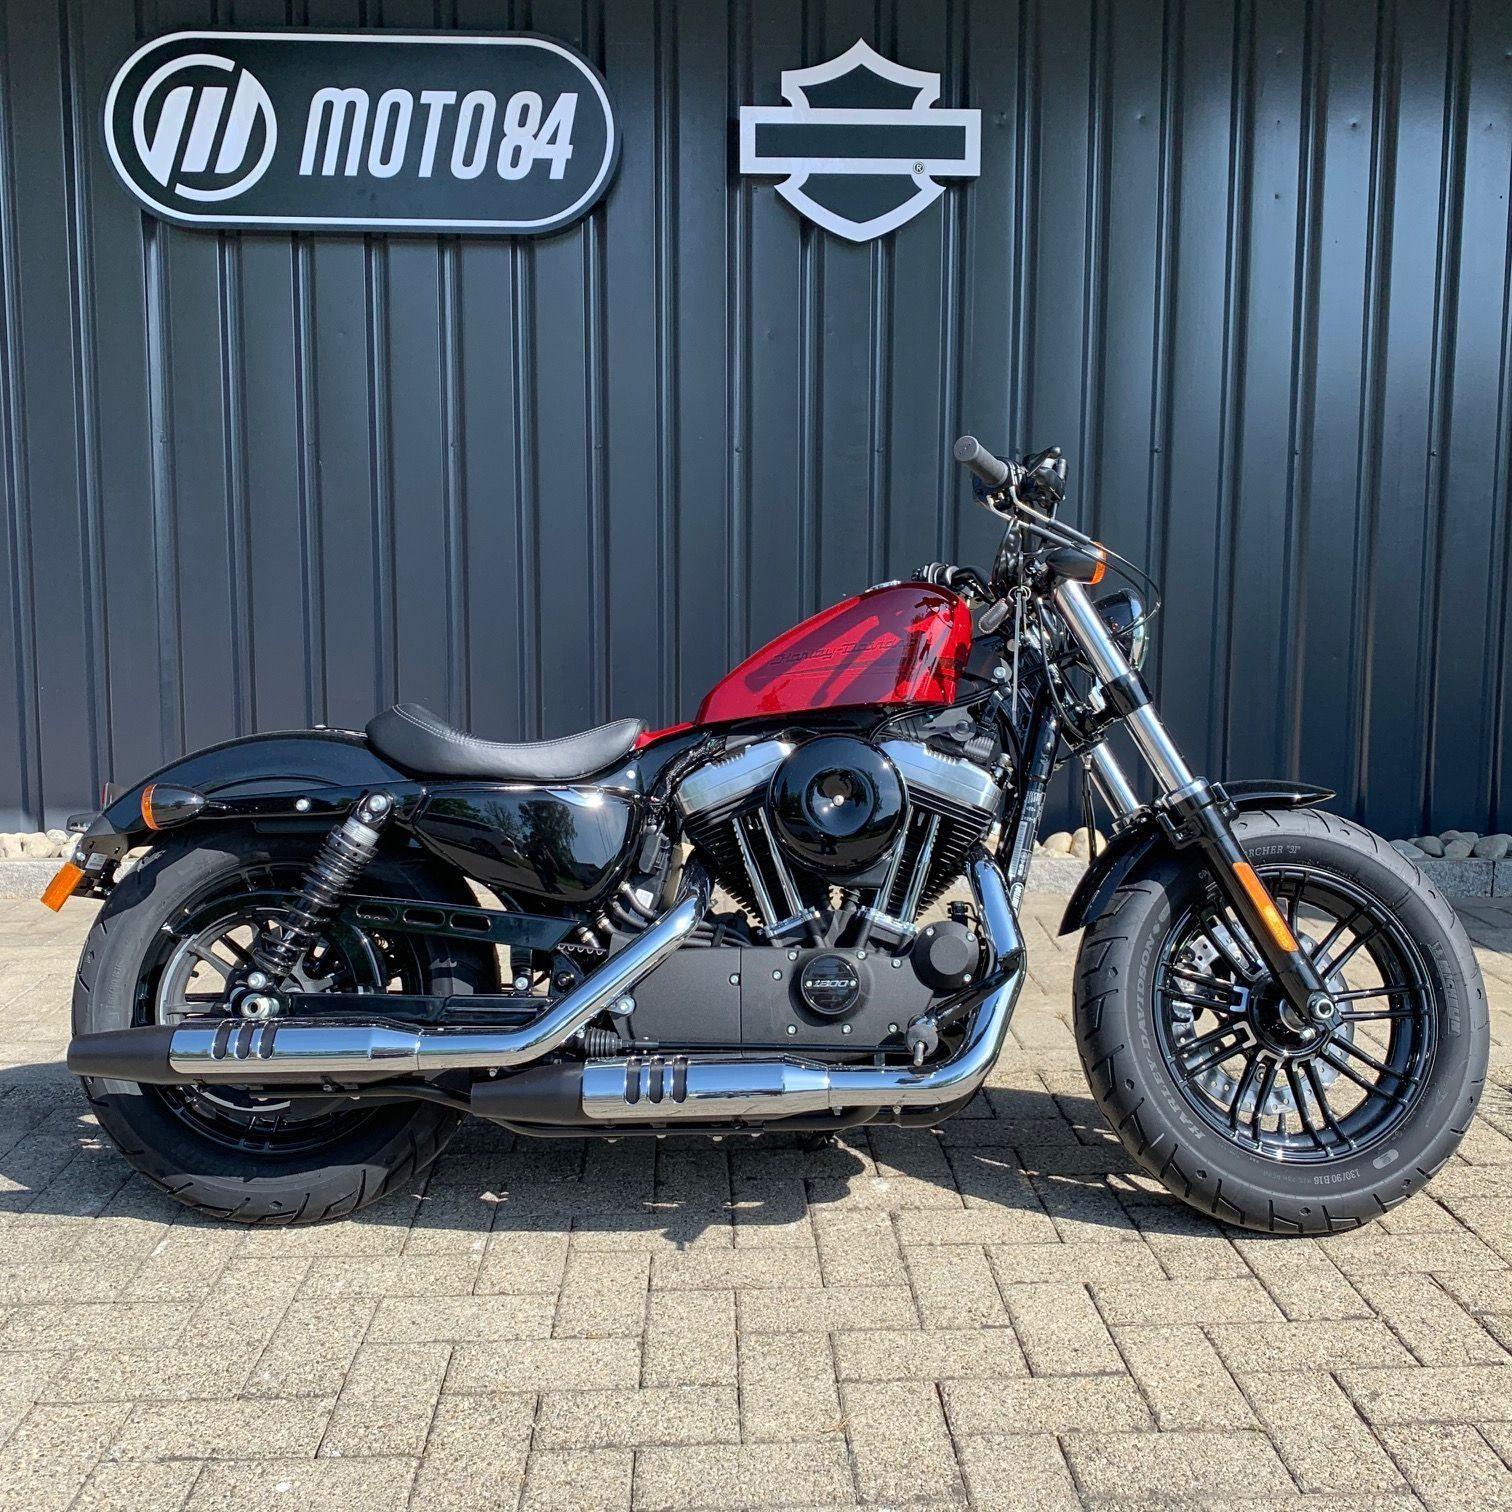 Motorrad Mieten Harley Davidson Xl 1200 X Sportster Forty Eight Moto84 Ag Weinfeldem